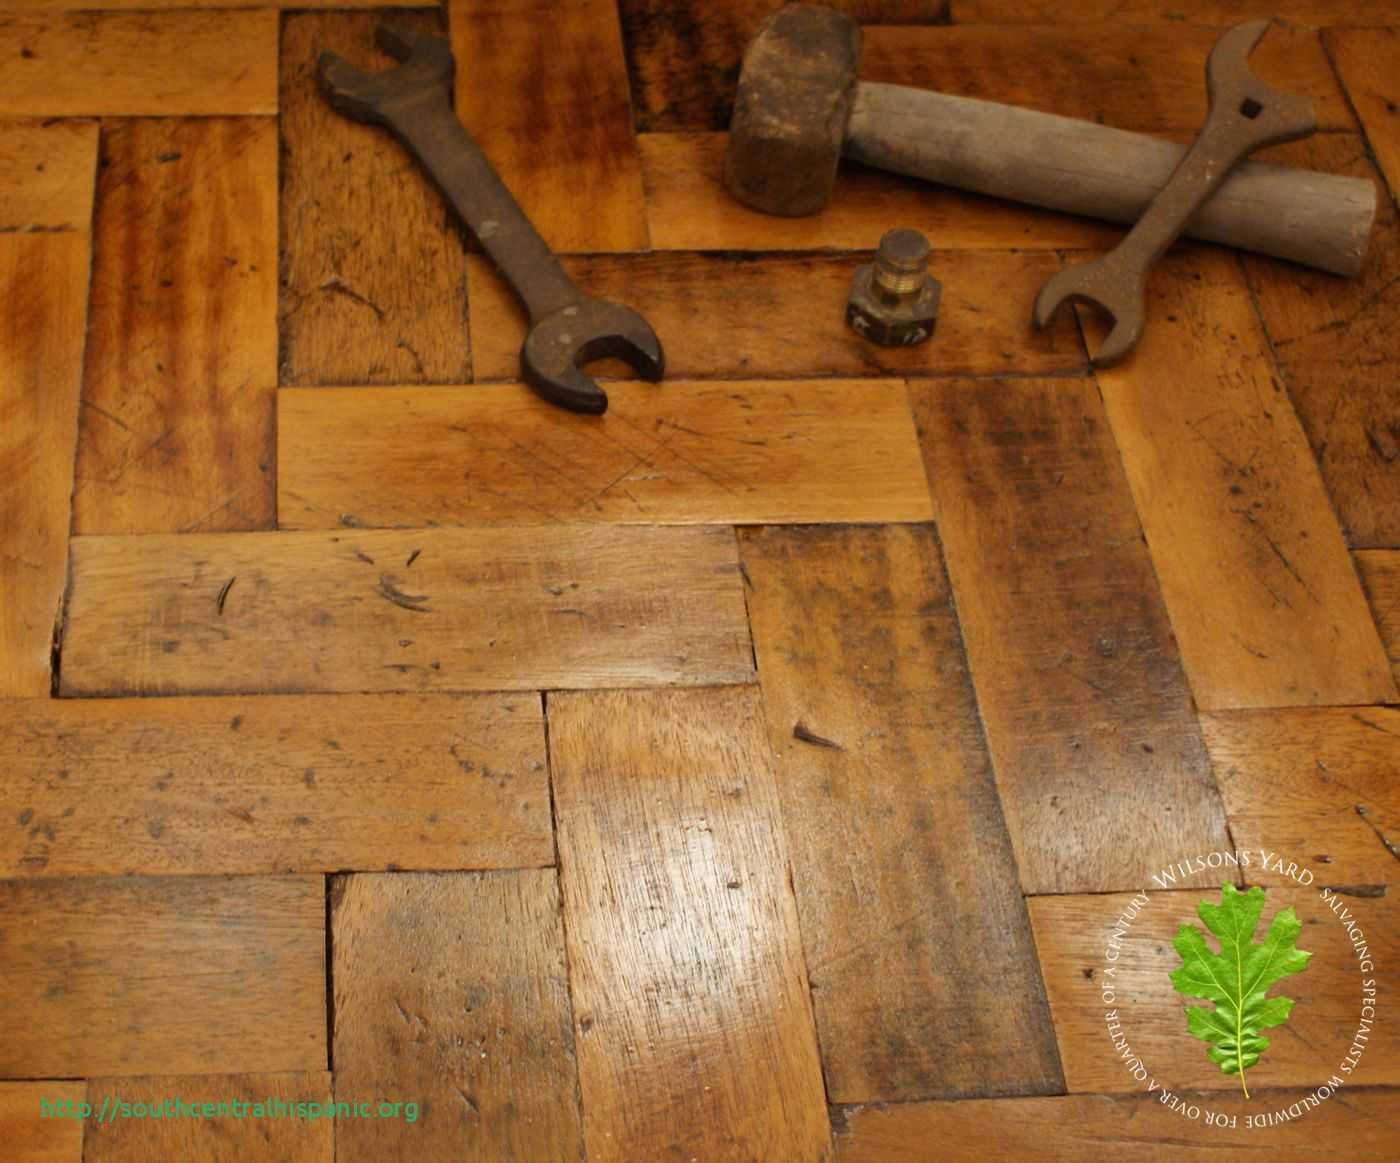 Discount Hardwood Flooring Liquidators Of Factory Wood Floors Www topsimages Com with Woodblock Floor Frais original Reclaimed Factory Wood Flooring Perfect for Mercial and Of Woodblock Floor Jpg